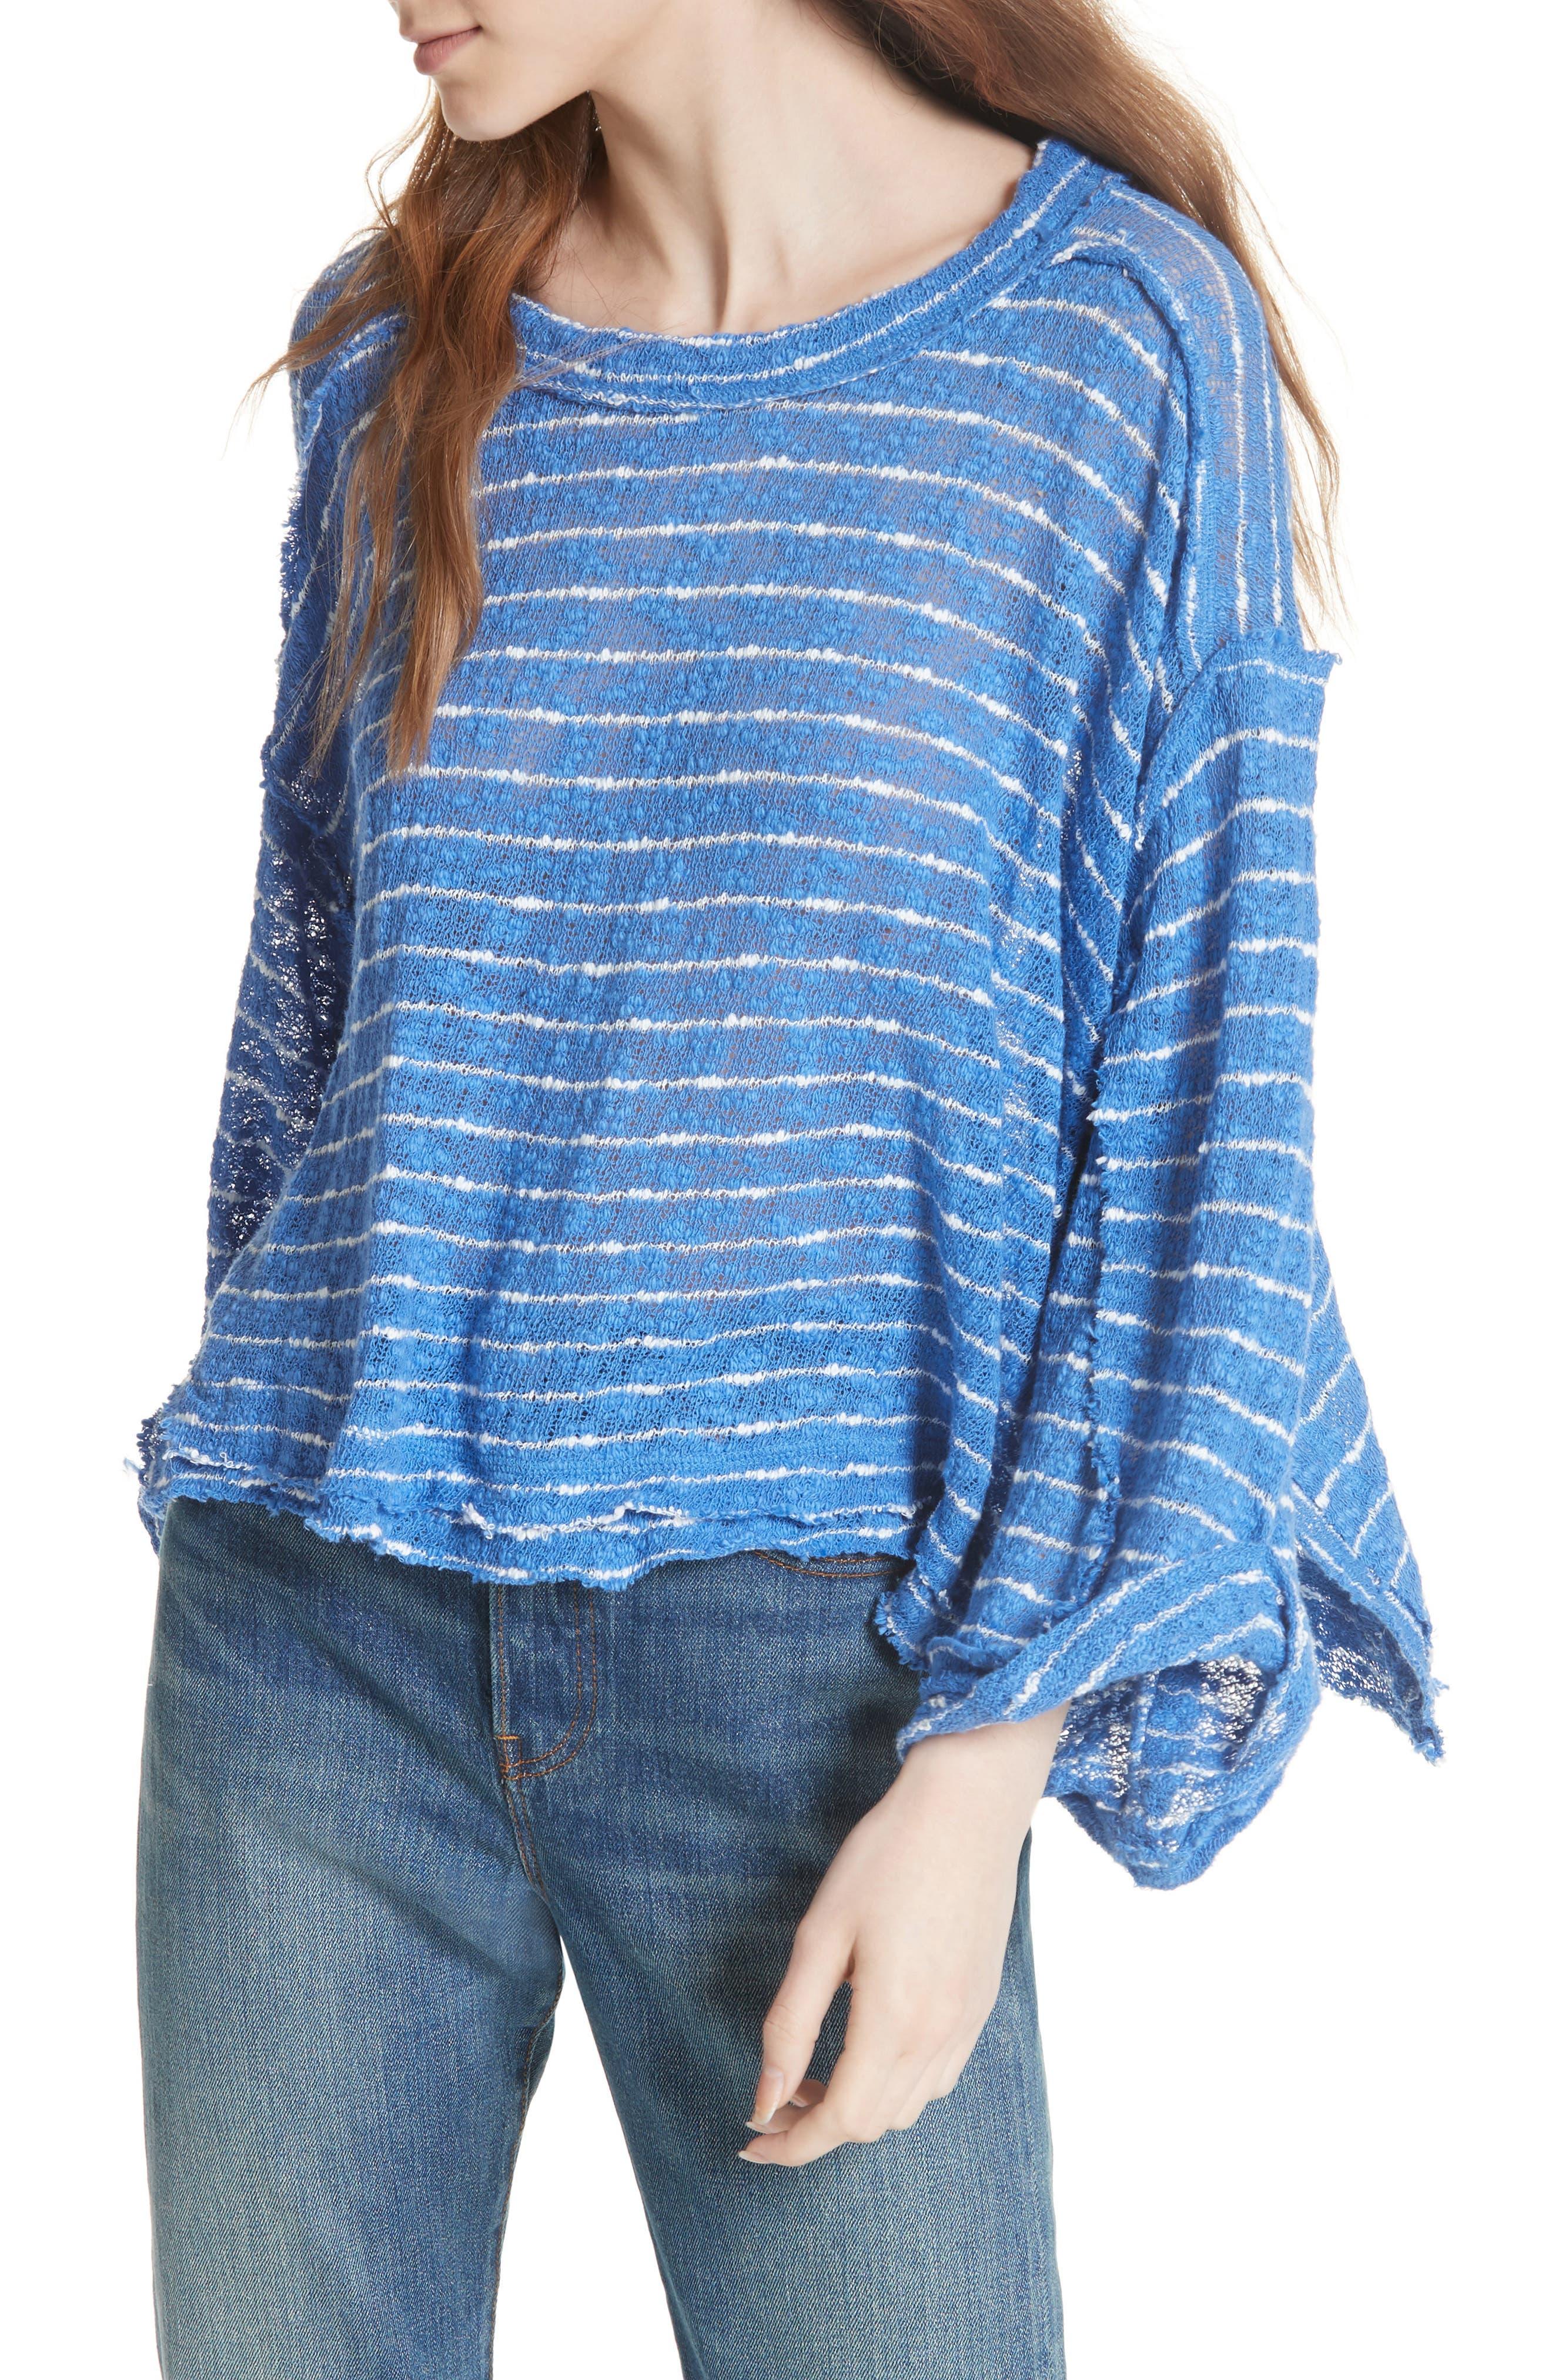 Alternate Image 1 Selected - Free People Island Girl Hacci Stripe Tee